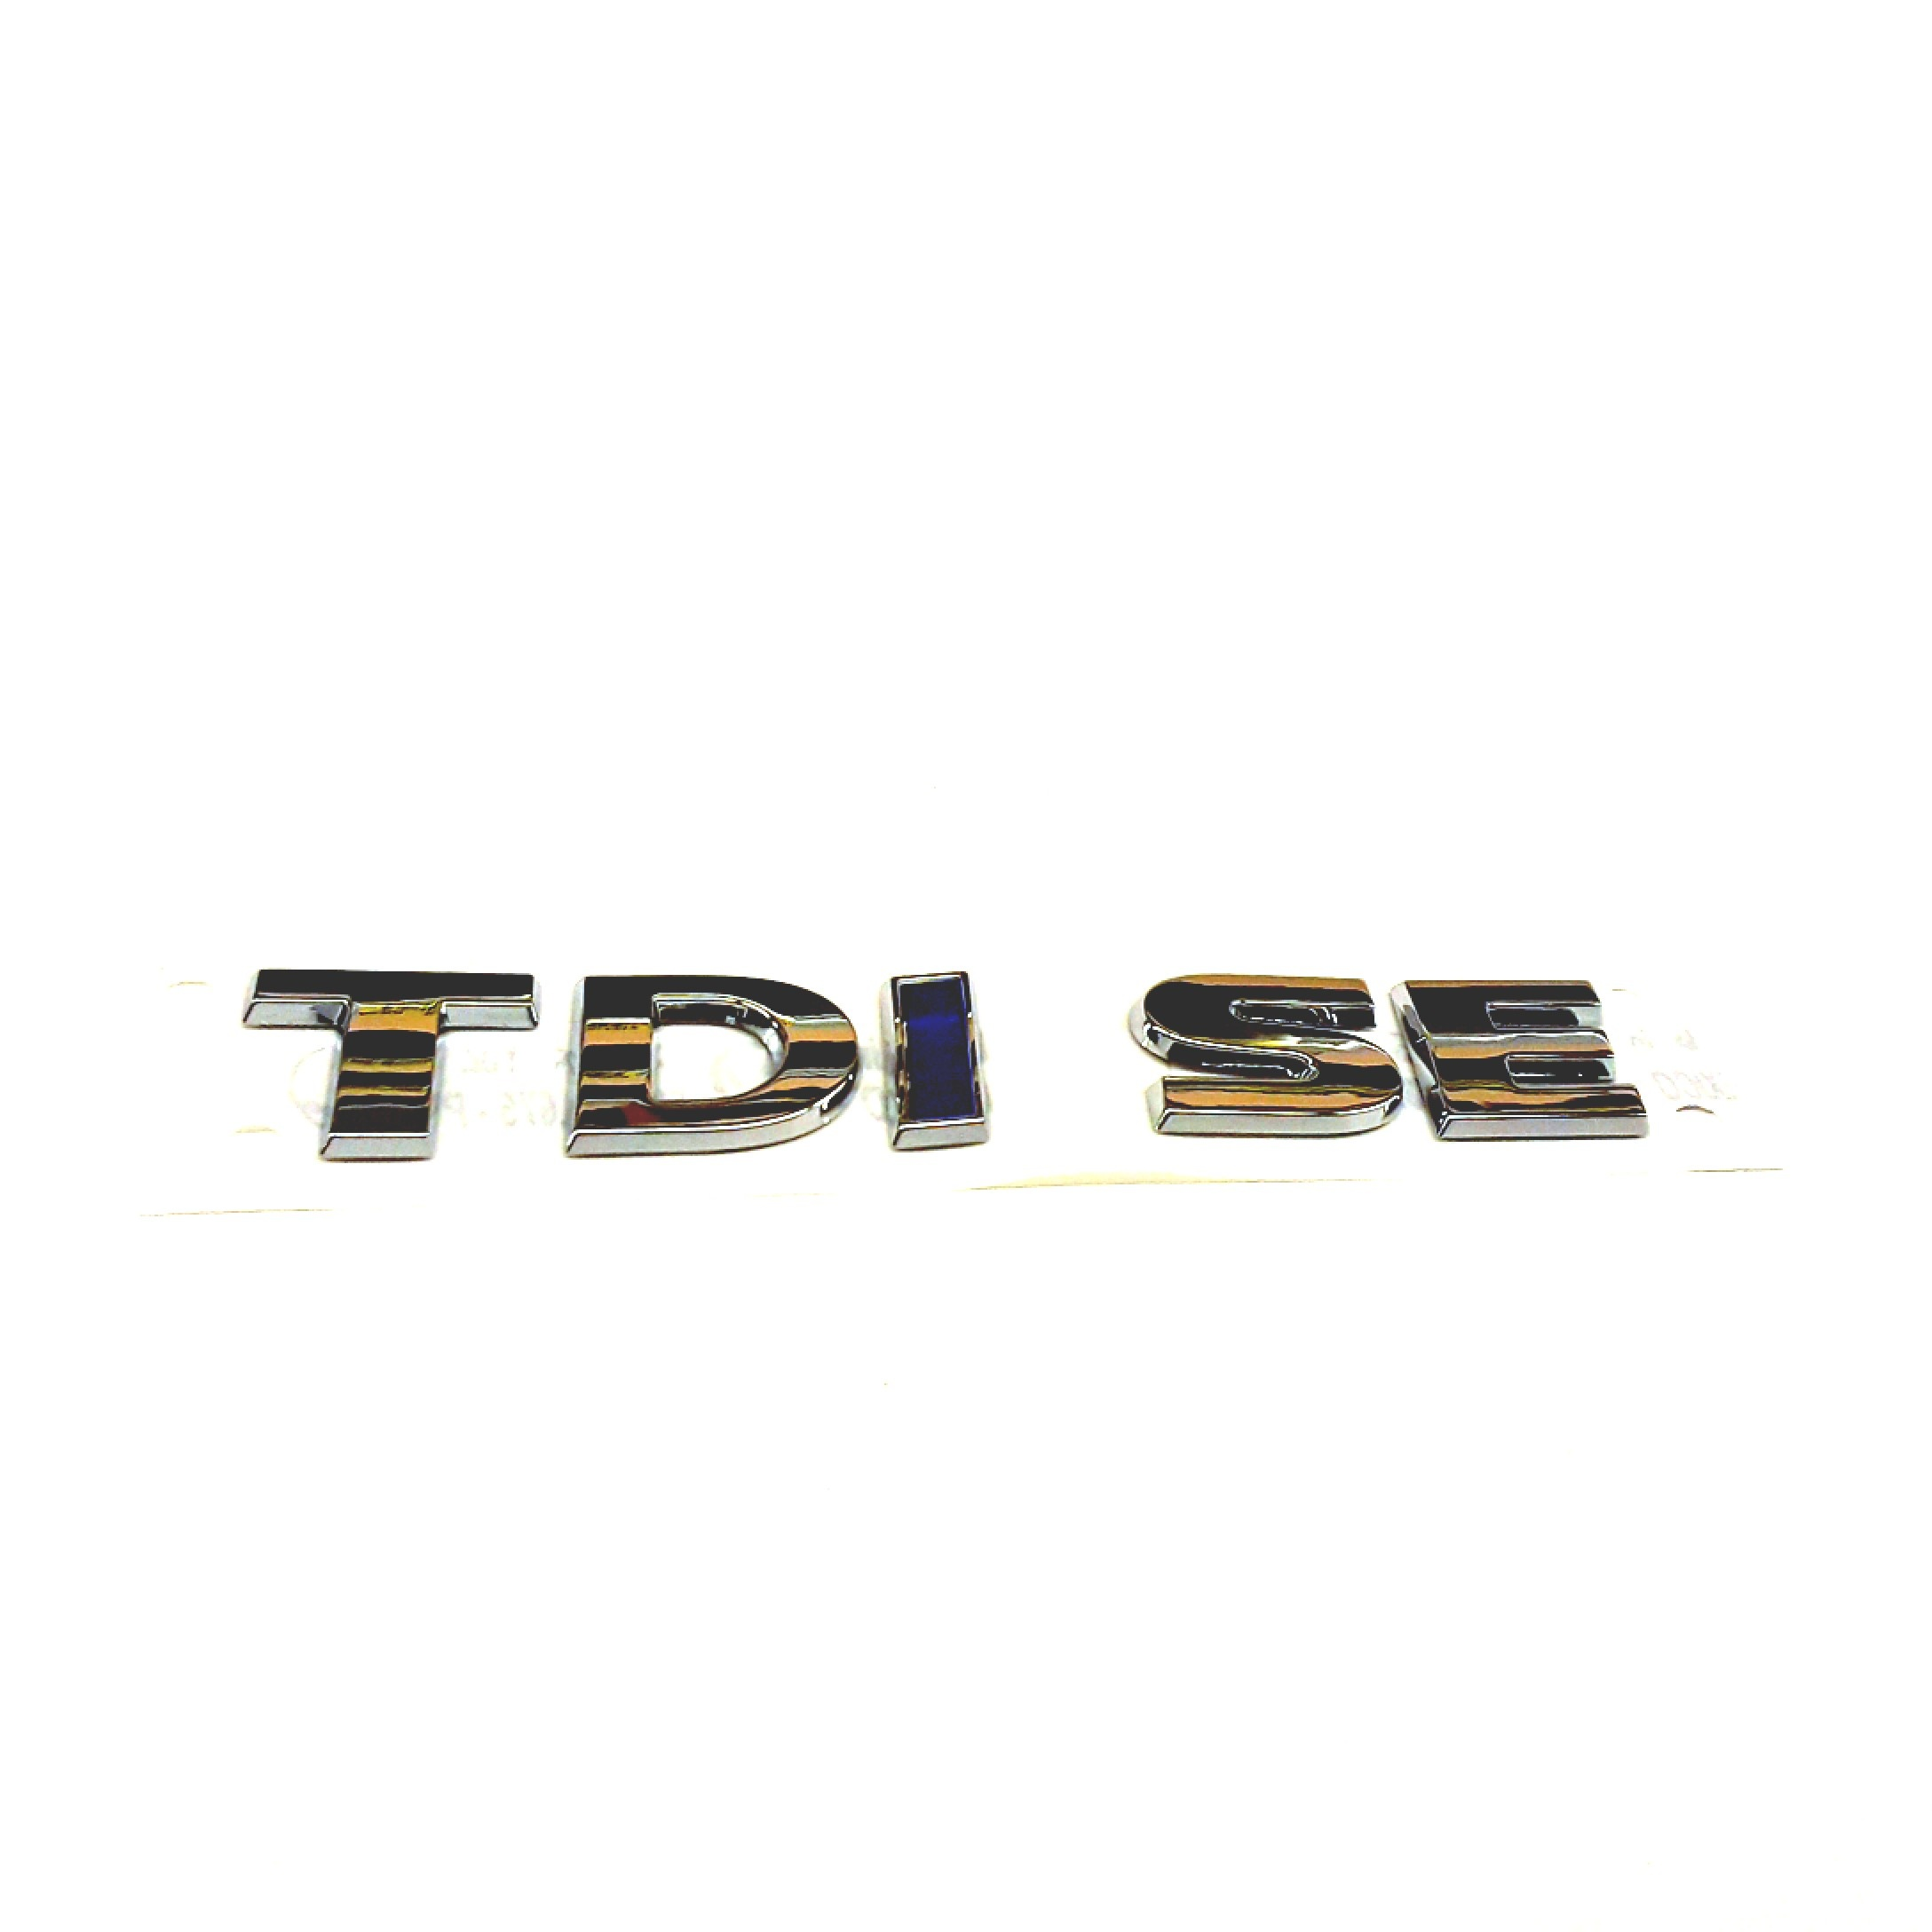 2015 Volkswagen Passat Tdi: 2015 Volkswagen Passat Deck Lid Emblem. Rear; TDI SE. TRIM